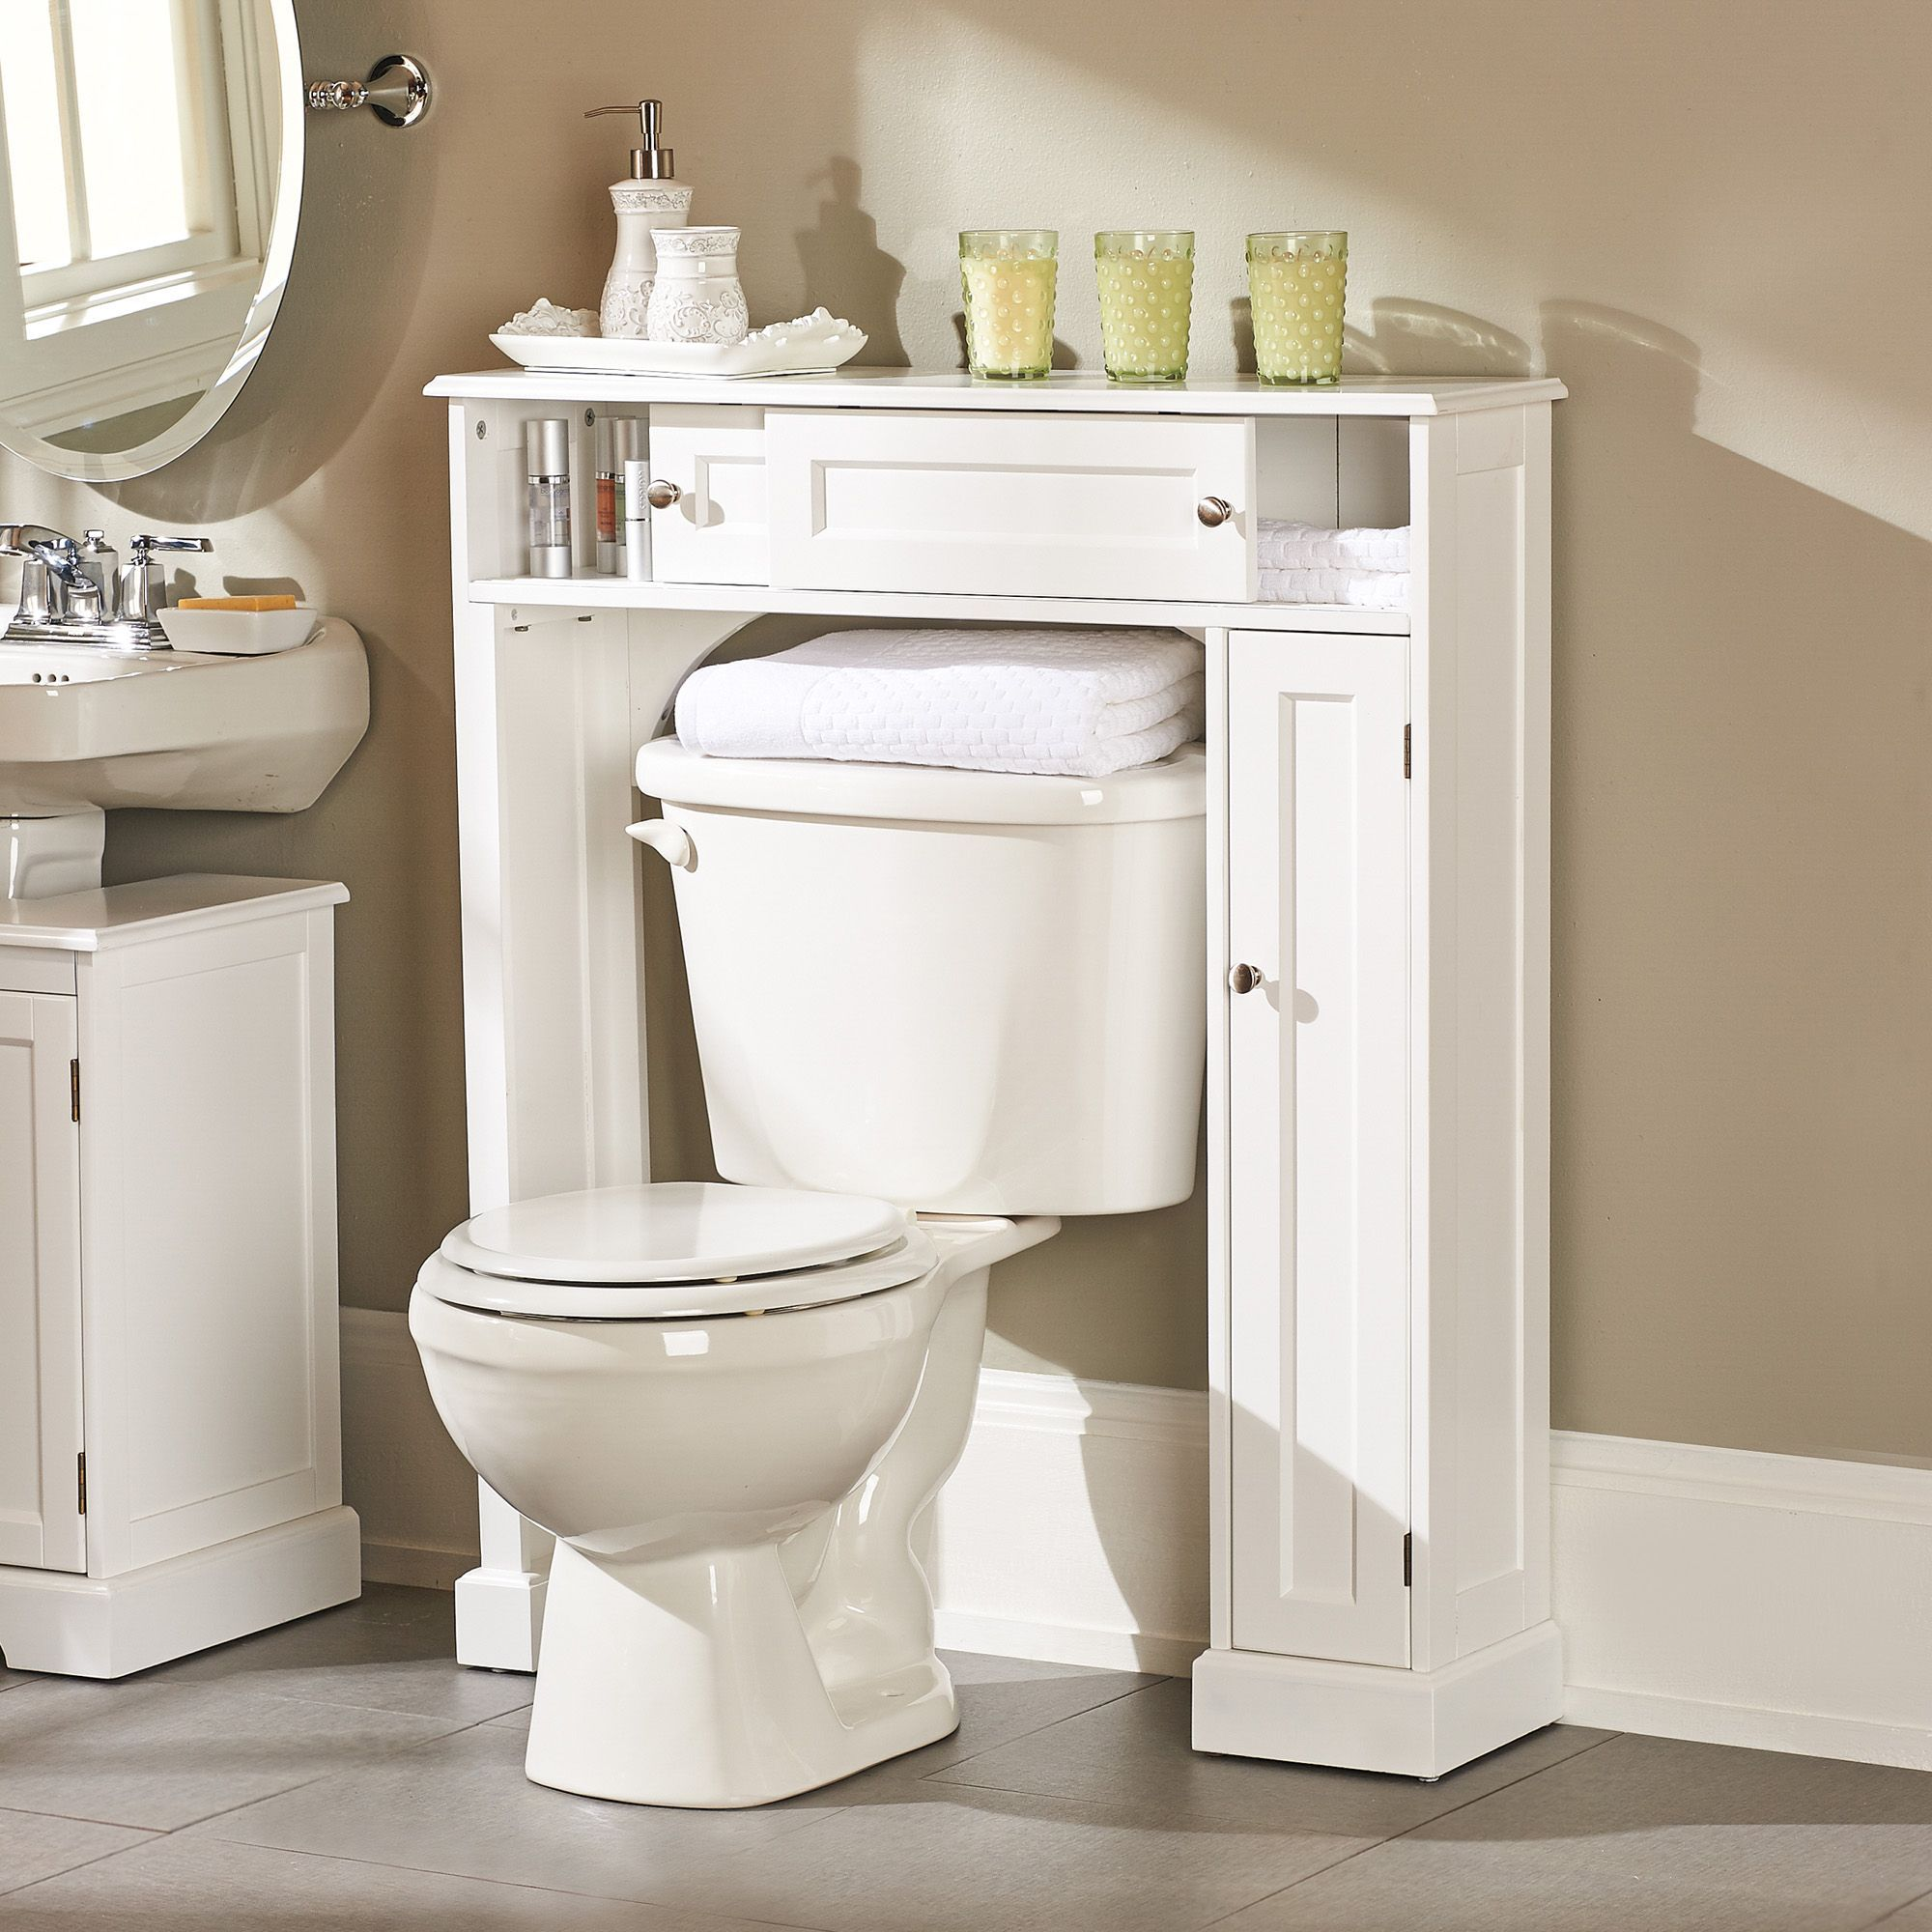 16++ Bathroom cabinet ideas above toilet information